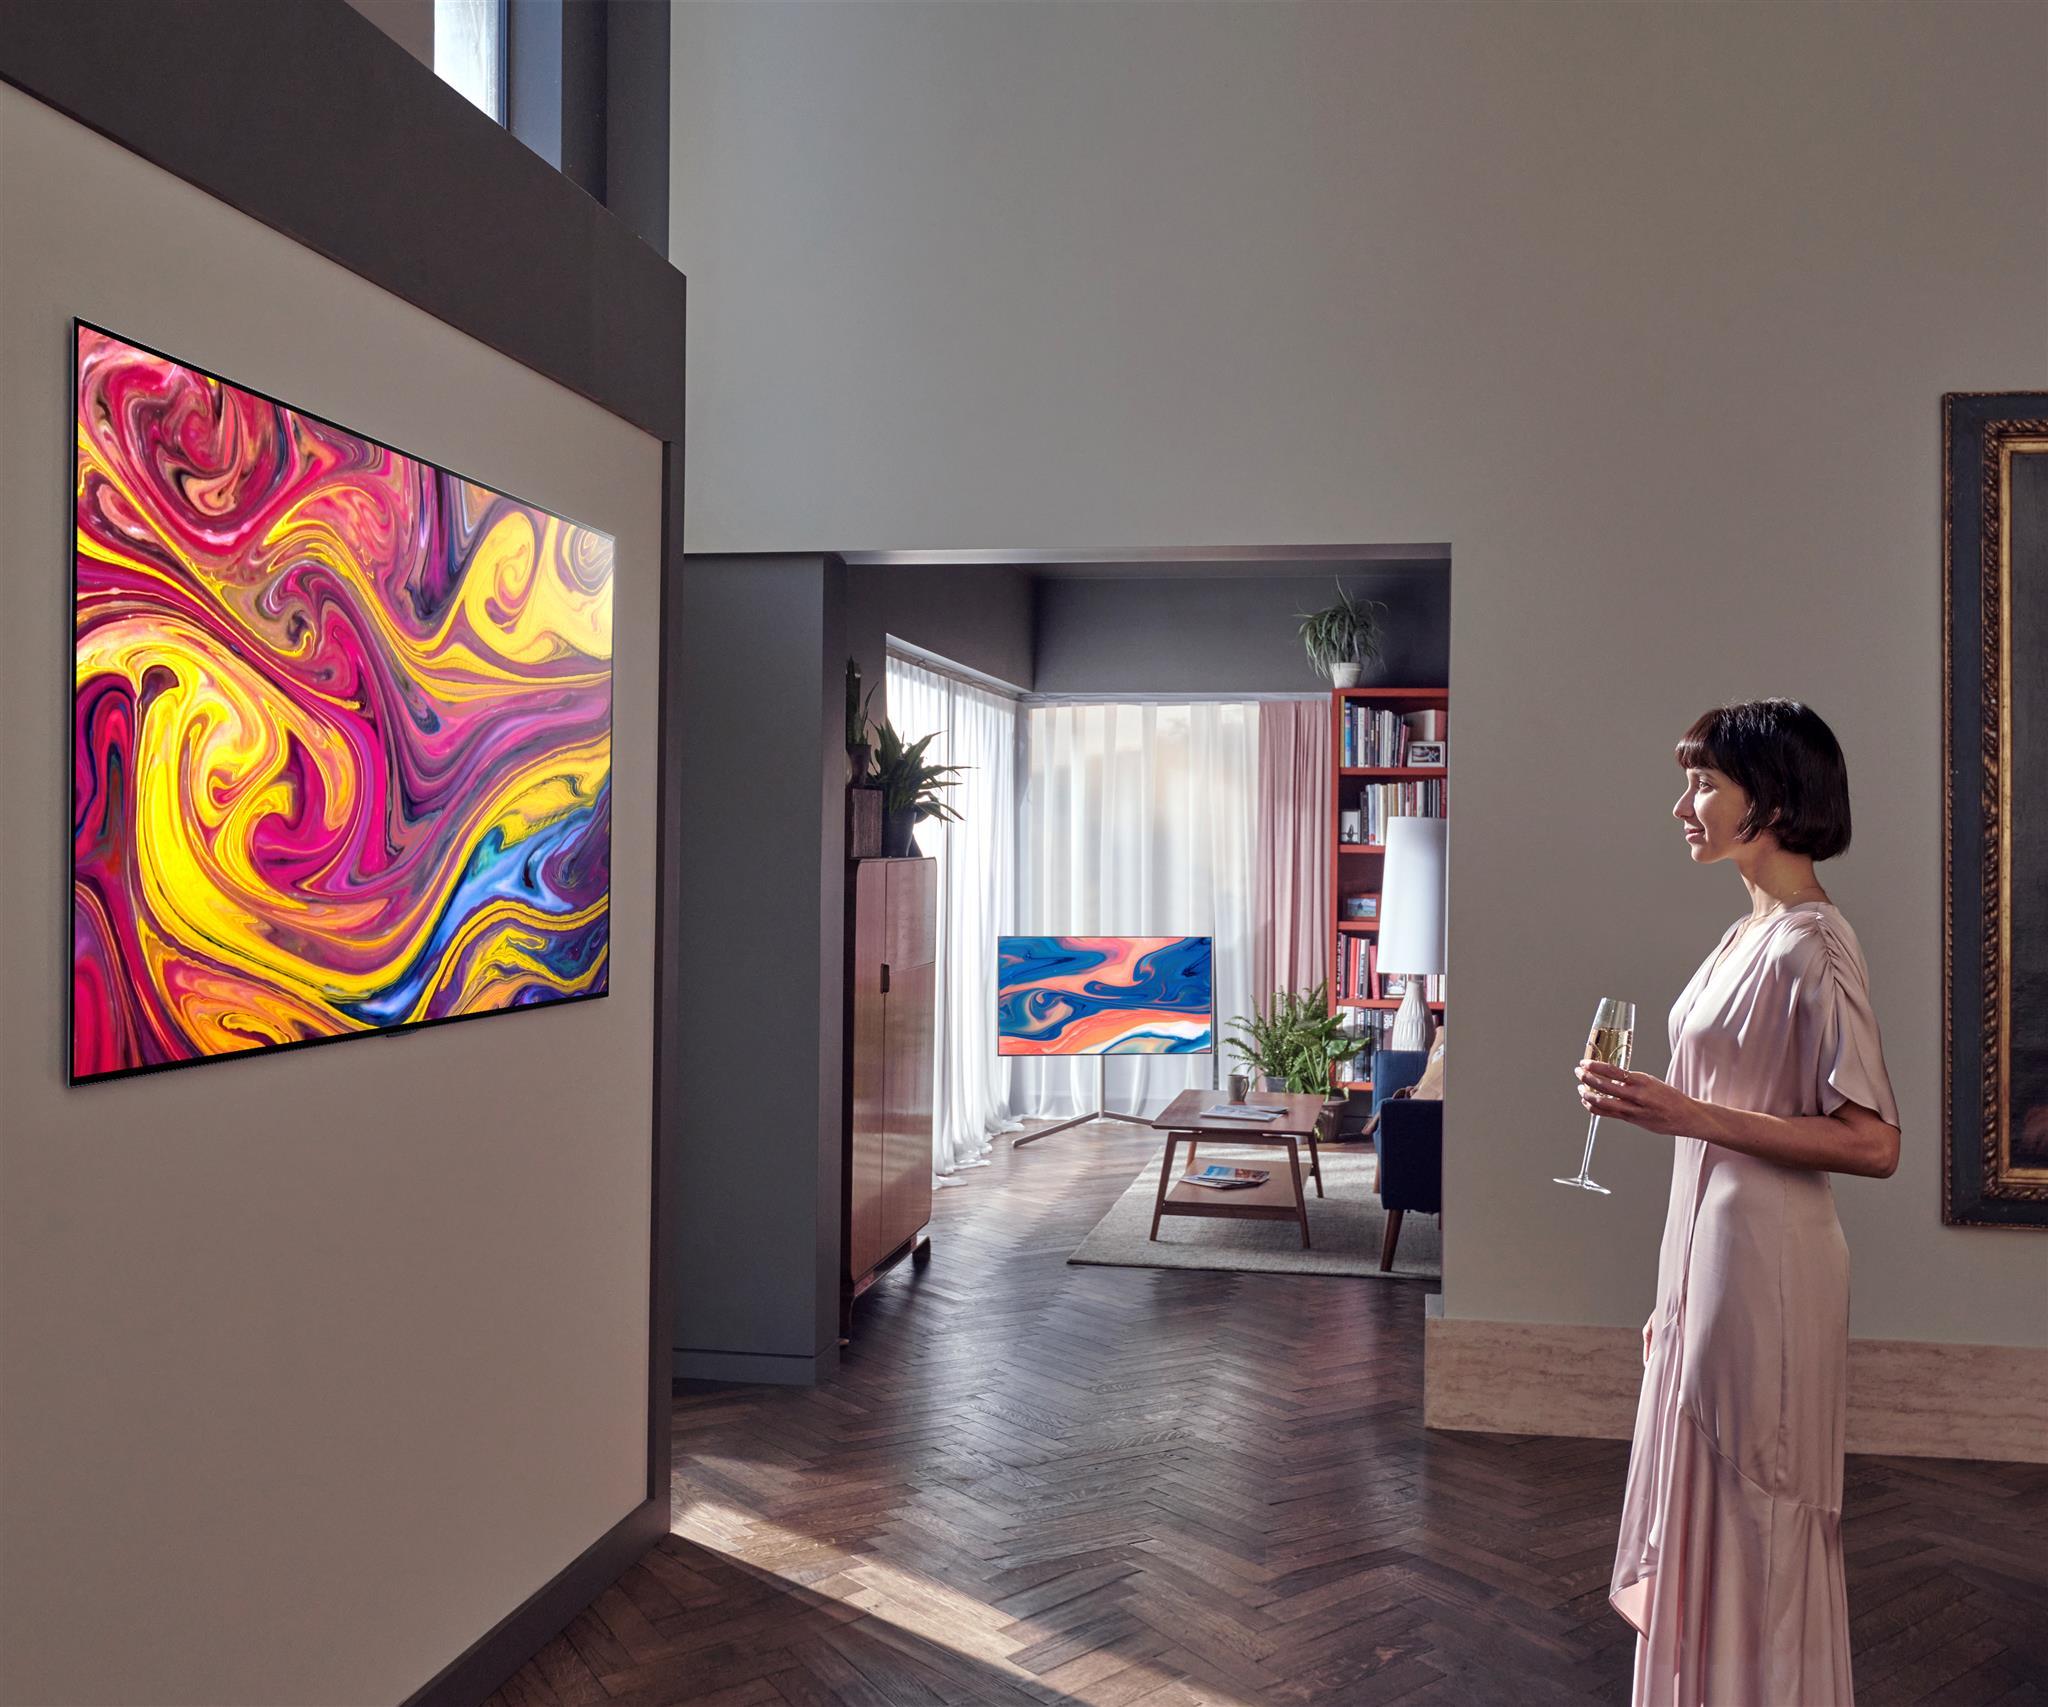 LG G1 OLED evo Gallery Design TV